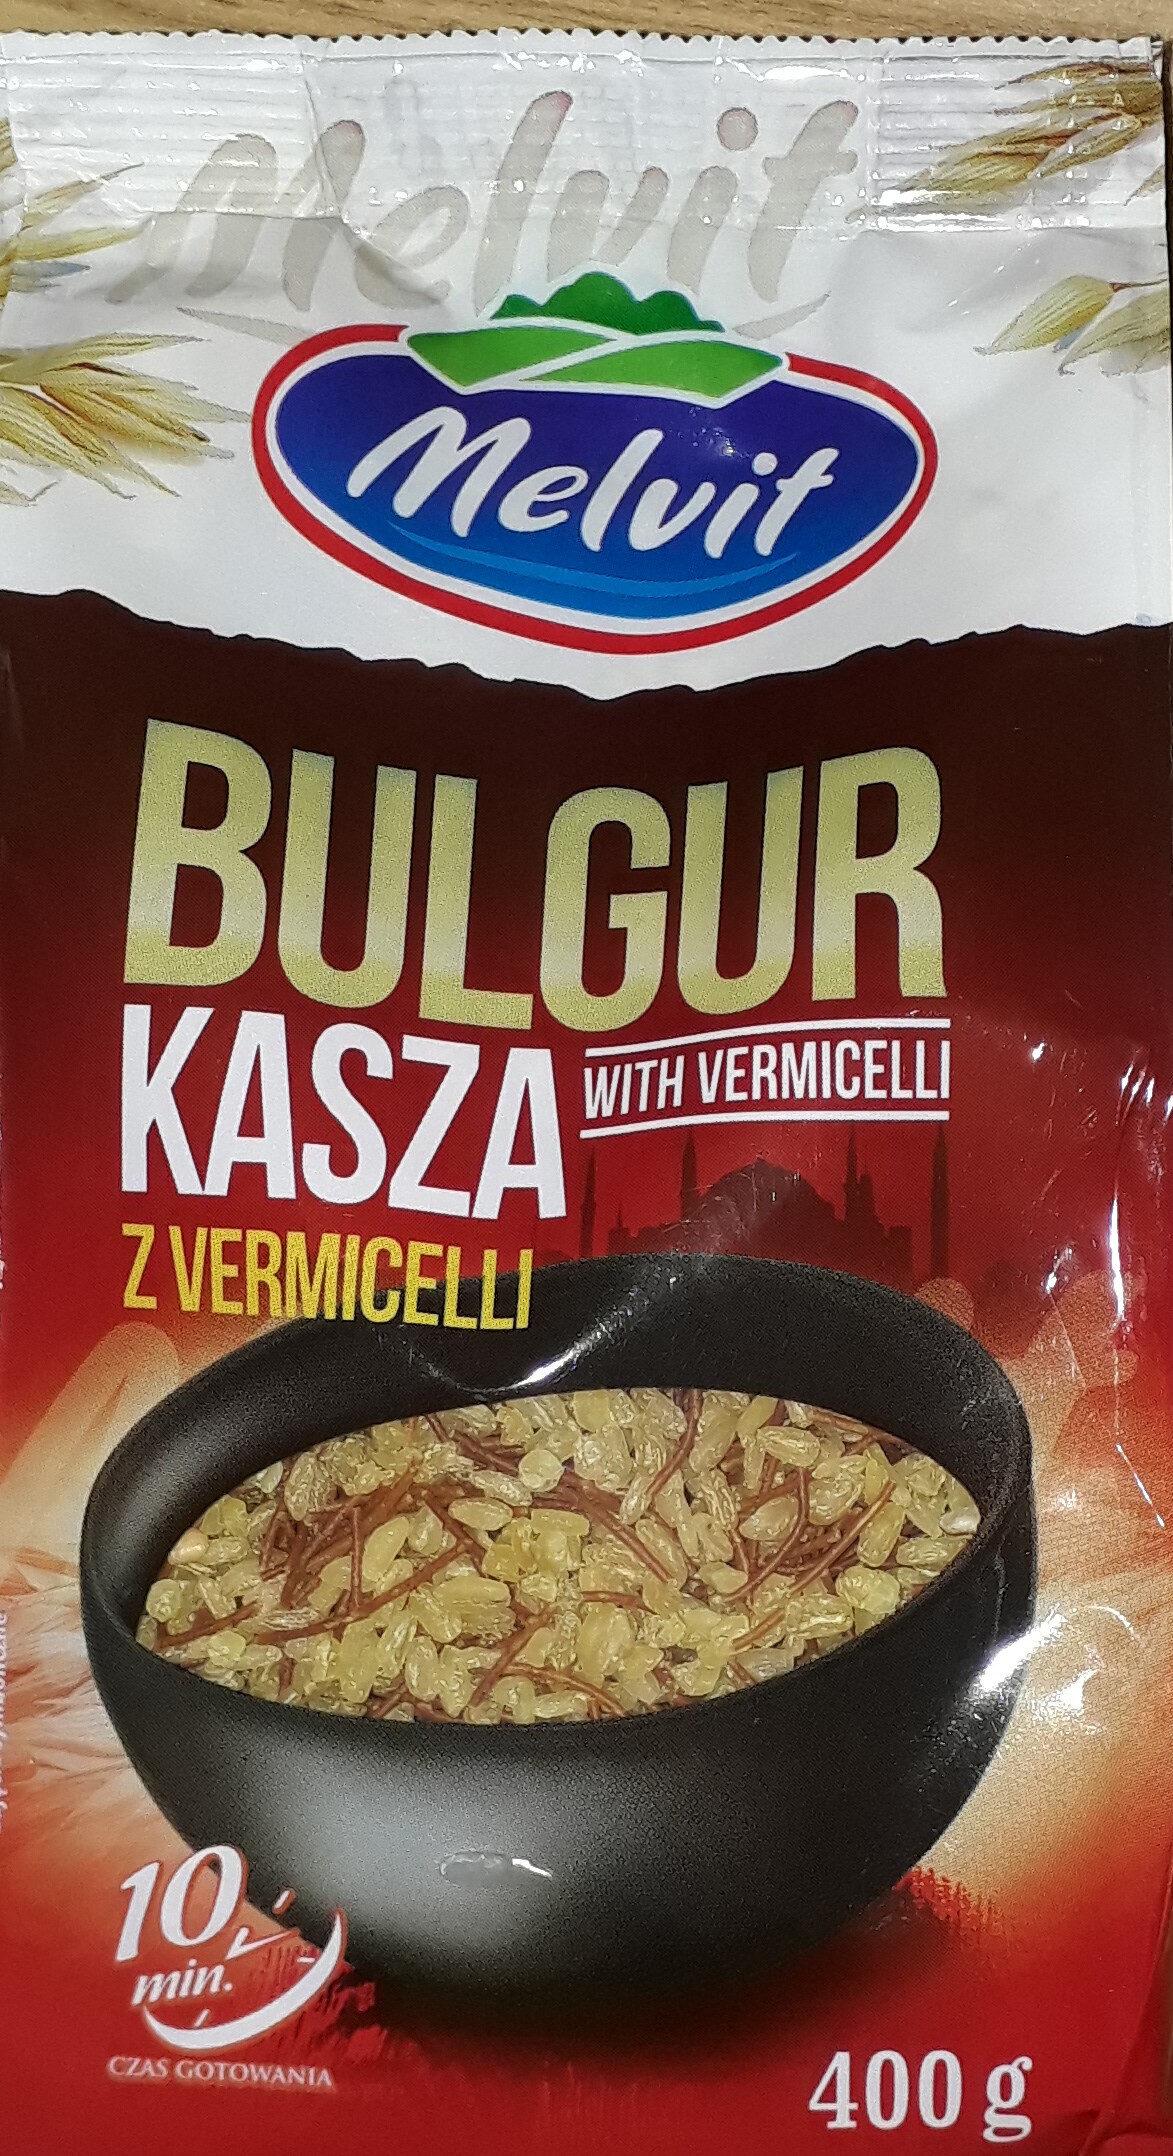 Kasza bulgur z vermicelli - Produit - pl